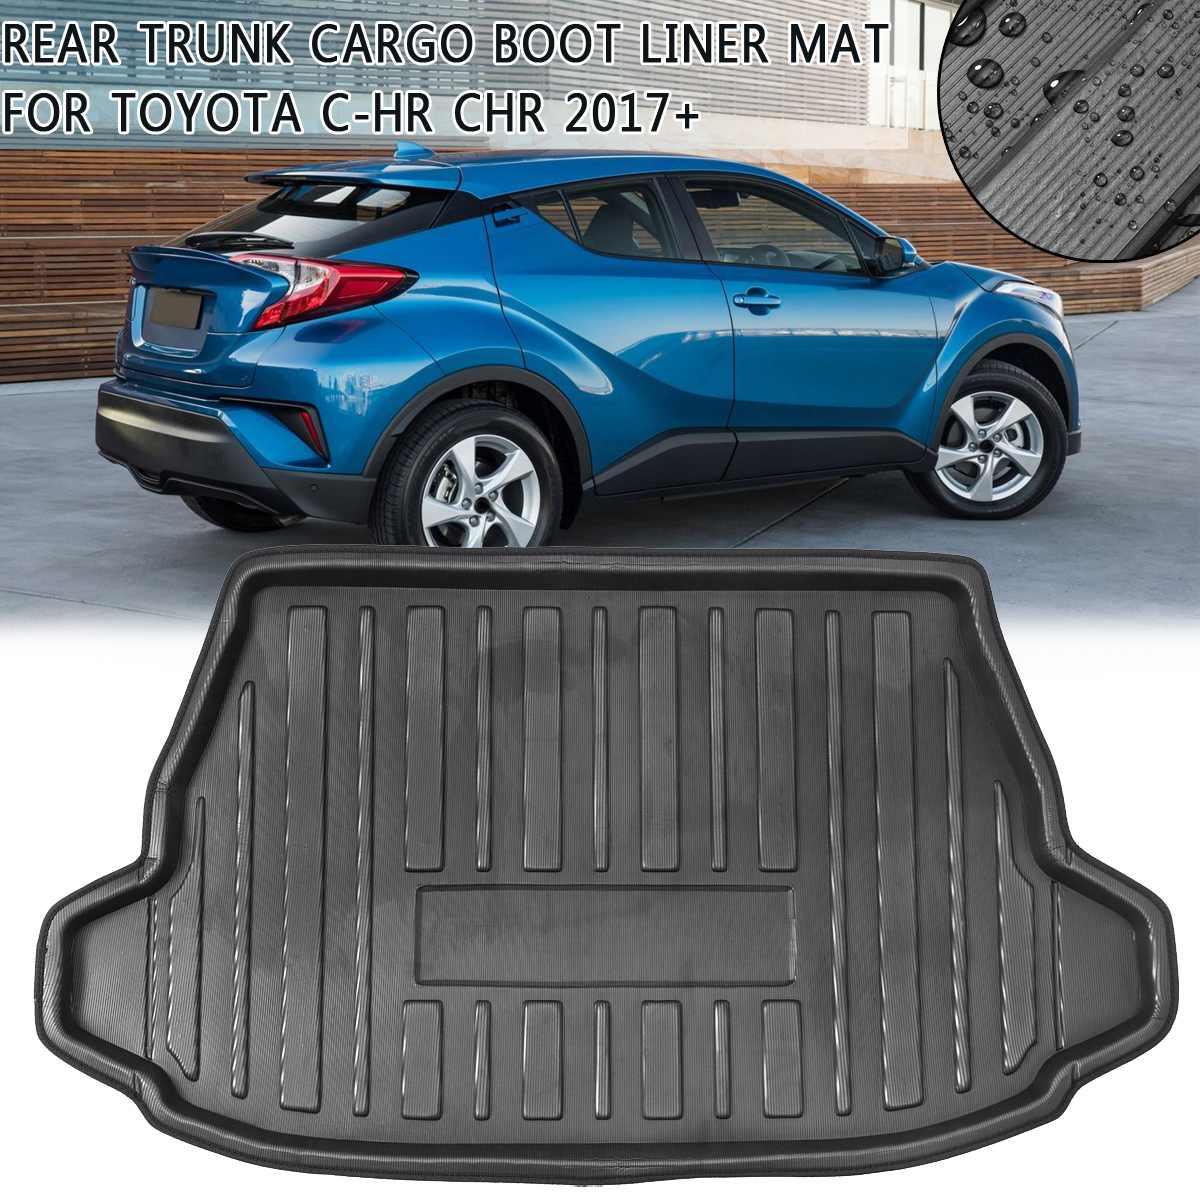 Boot Mat wkładka do bagażnika Toyota C-HR CHR 2017 2018 2019 + Cargo podłoga podkładka wykładzinowa Mud Pad Kick Guard Protector wodoodporna